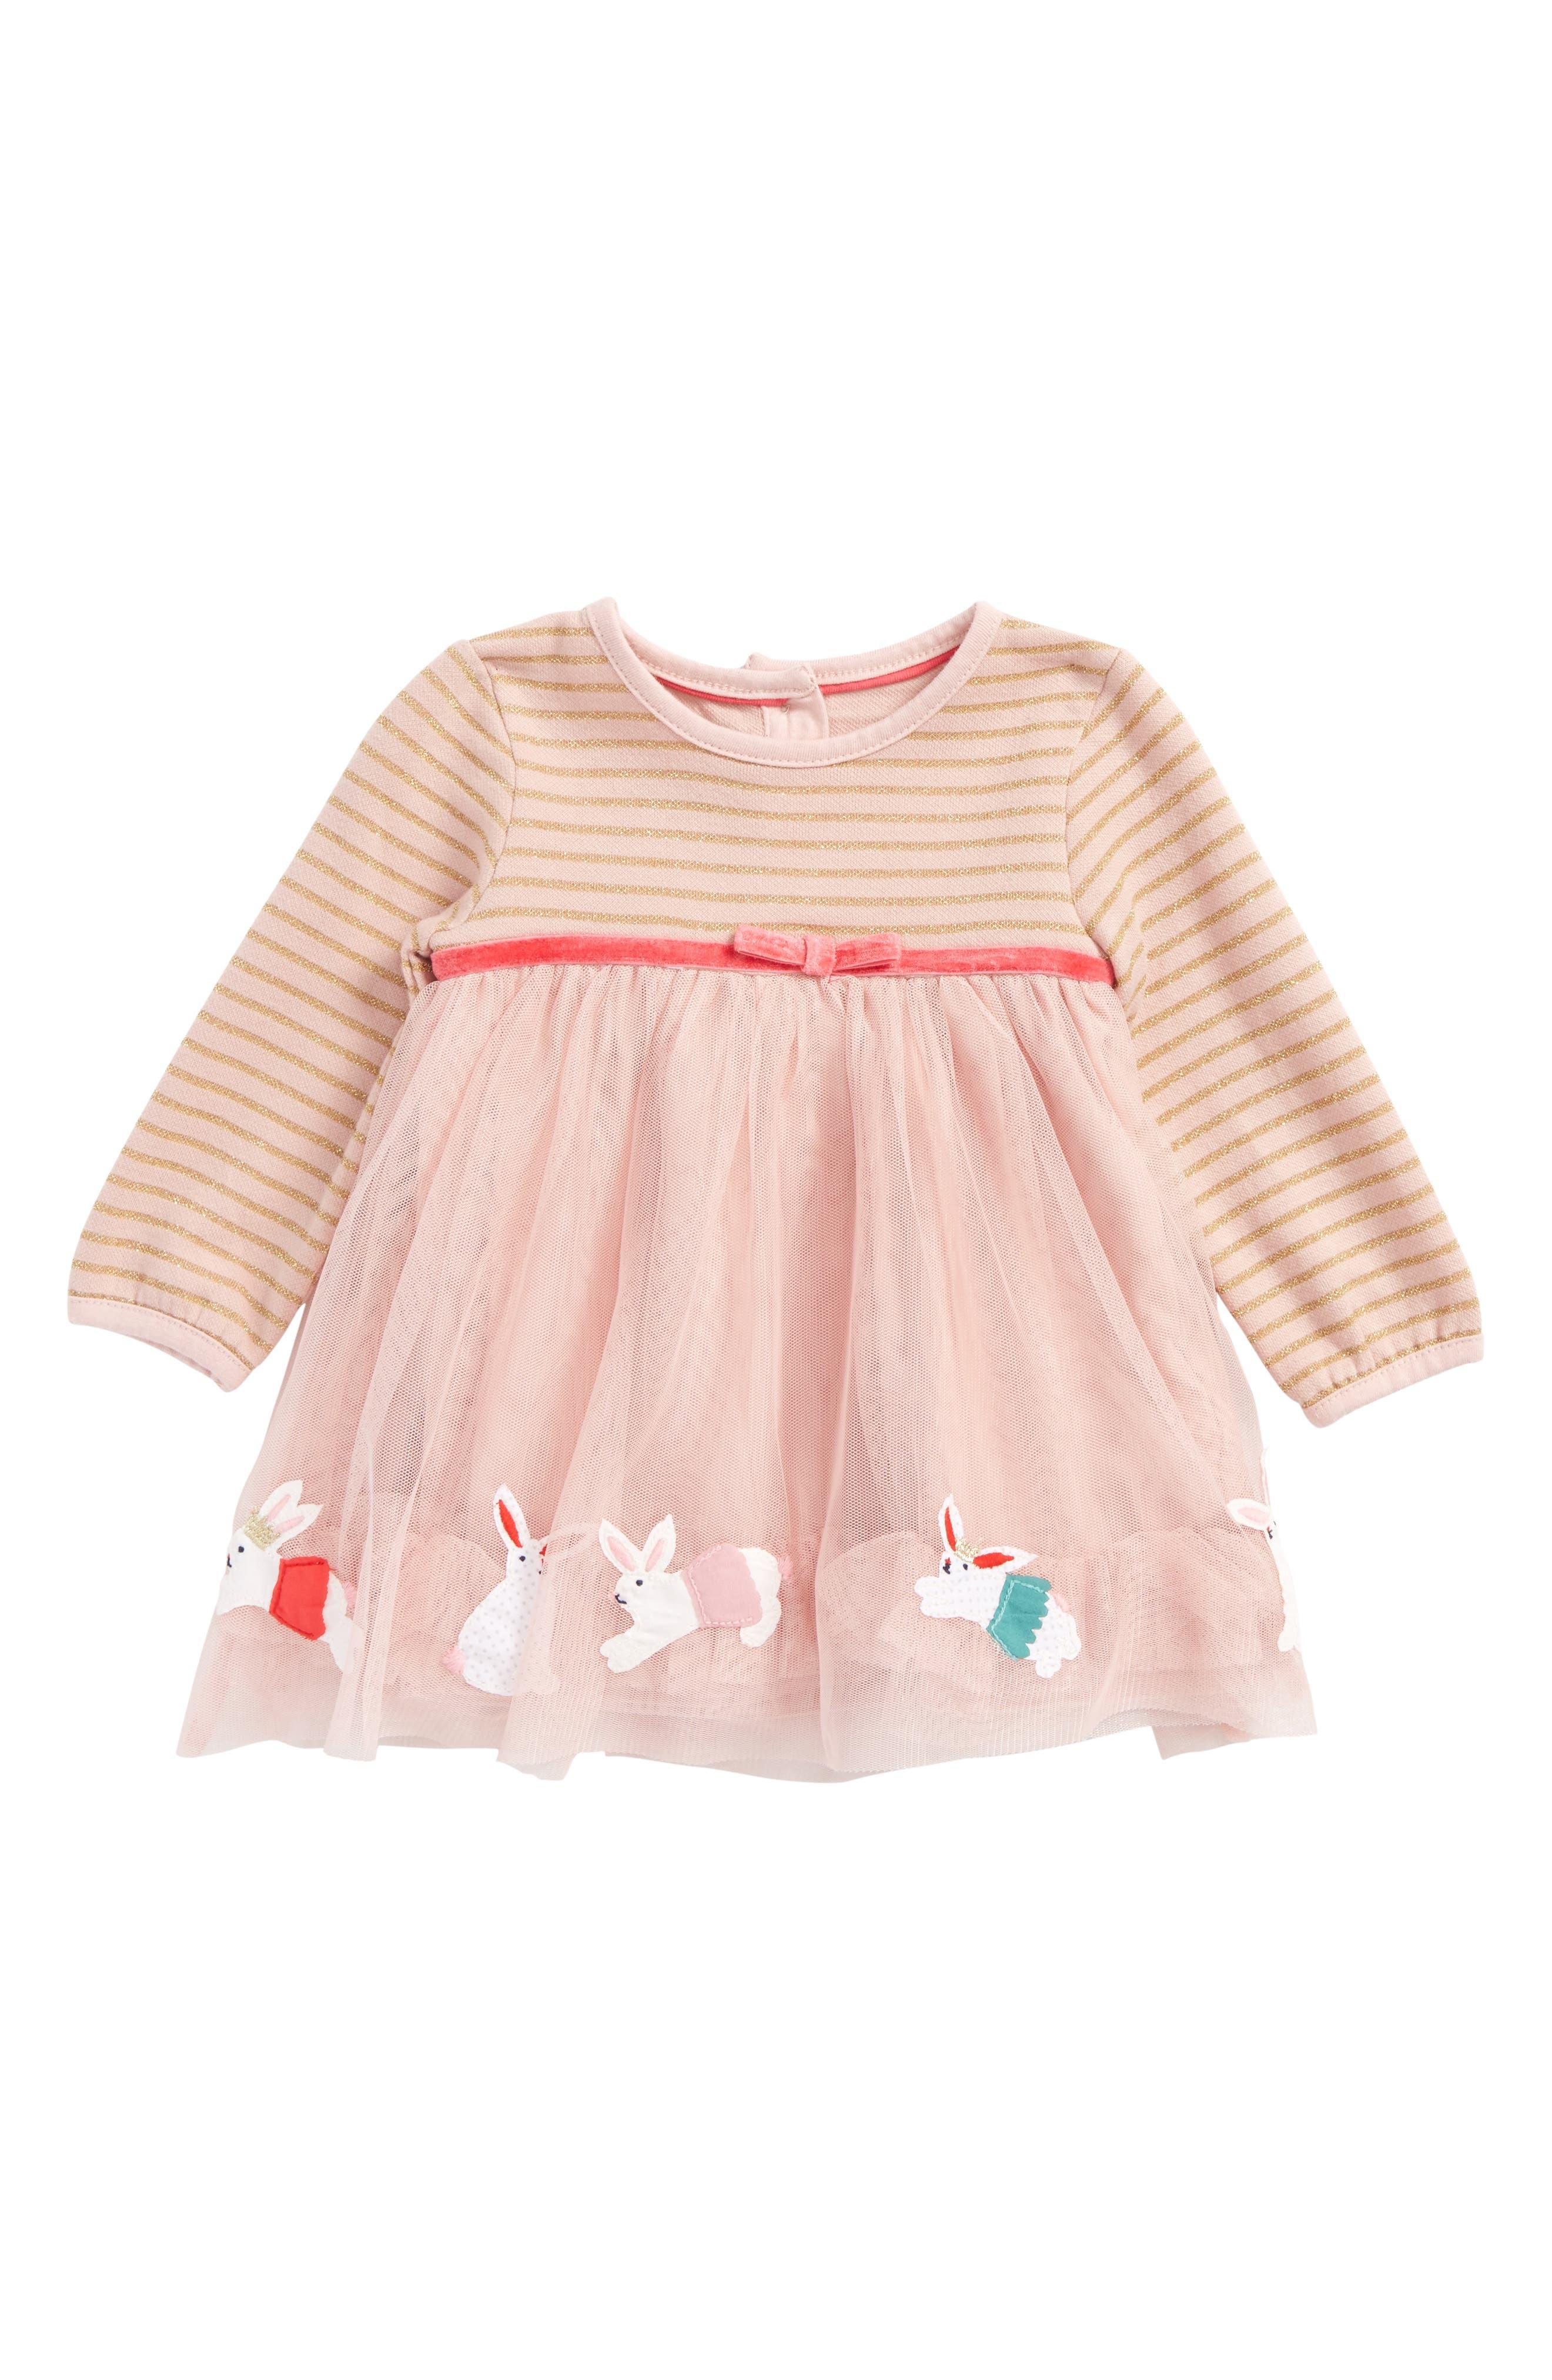 Appliqué Mixed Media Dress,                         Main,                         color, Milkshake Pink Bunnies